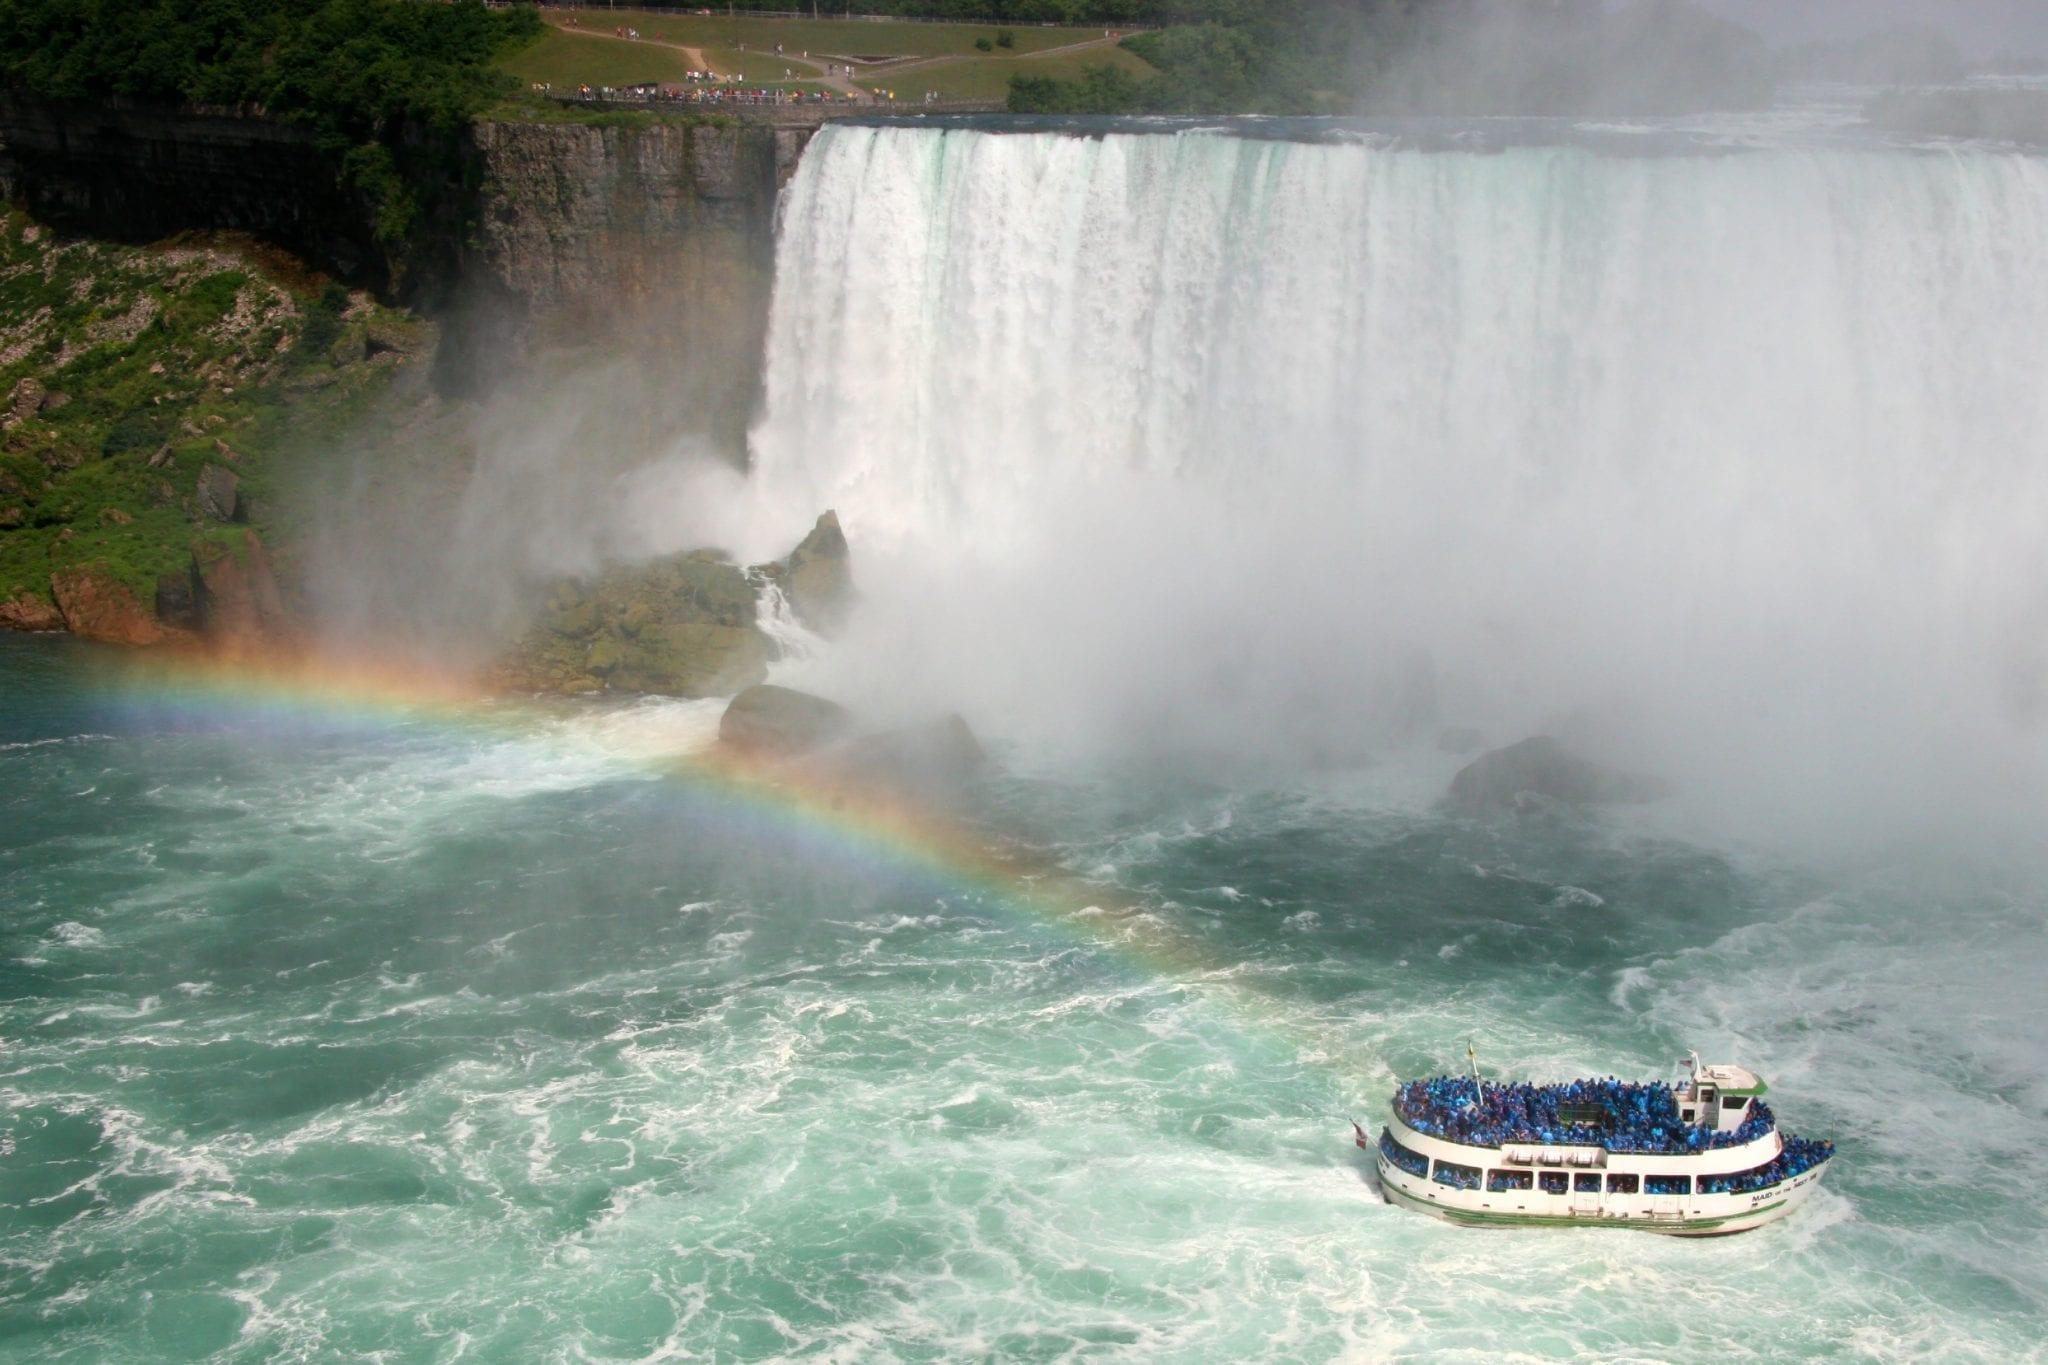 Wanderlust | Good Life of a Housewife Niagara Falls | Maid of the mist Boat Tour Niagara Falls